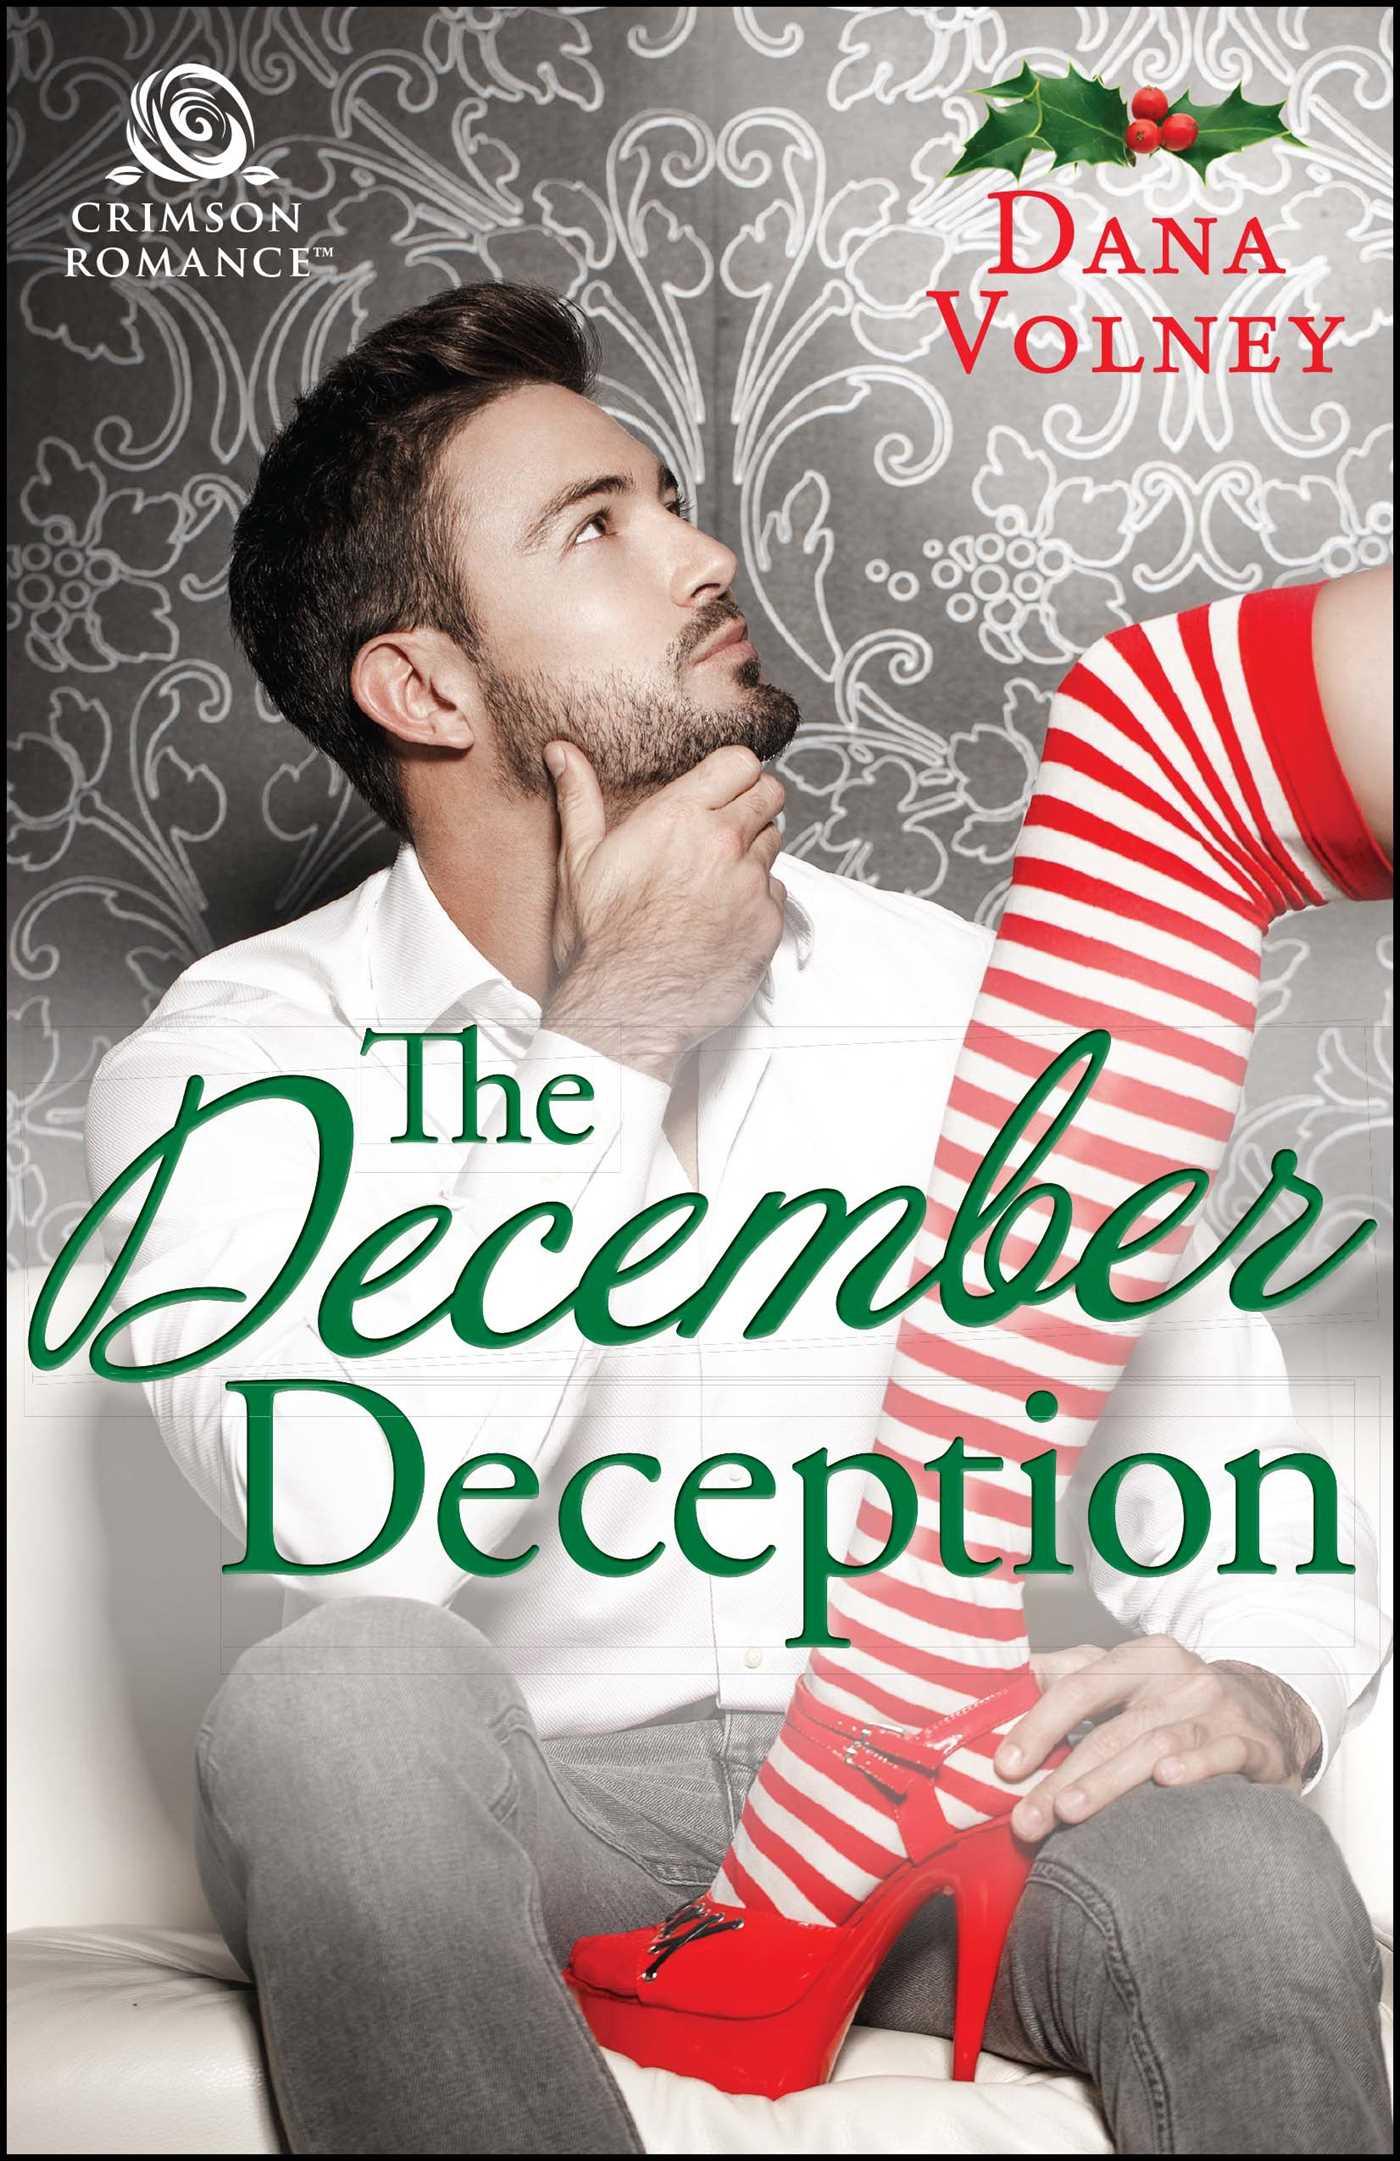 The december deception 9781507208533 hr